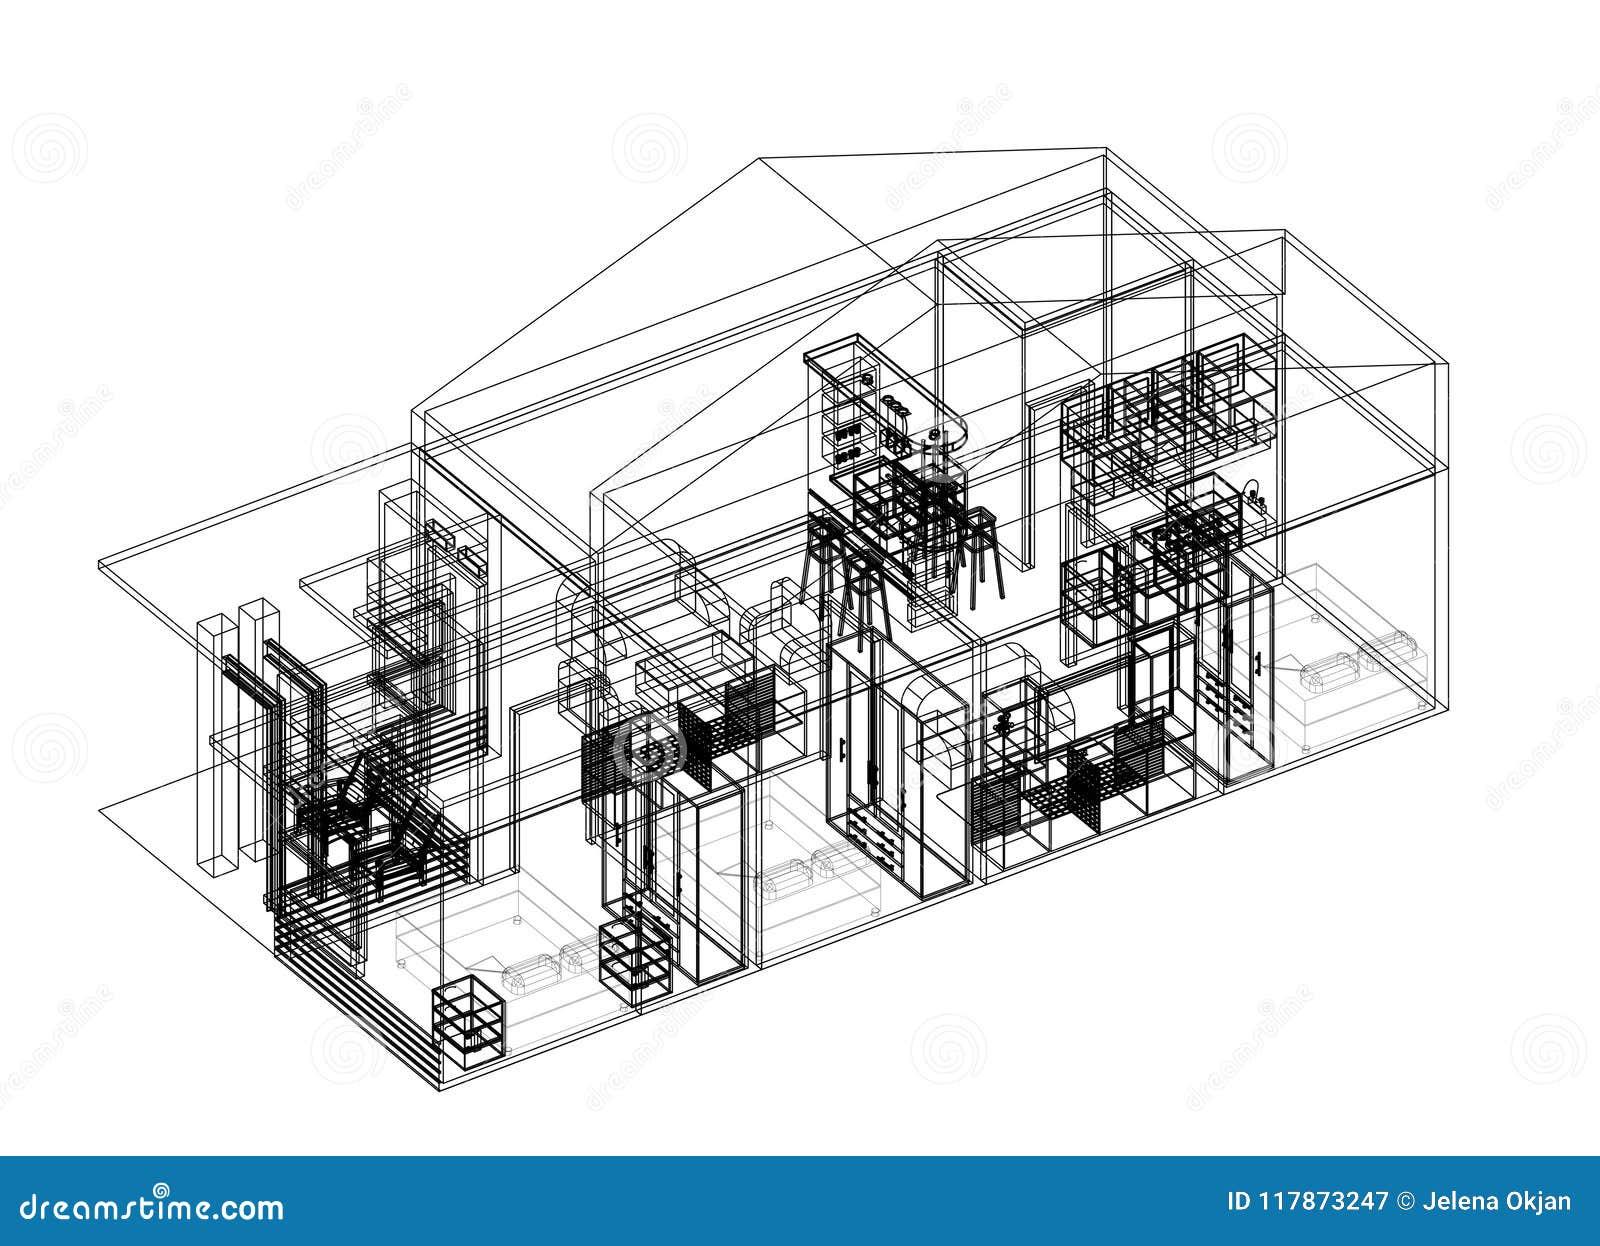 House architect design blueprint isolated stock image image of house architect design blueprint isolated malvernweather Gallery